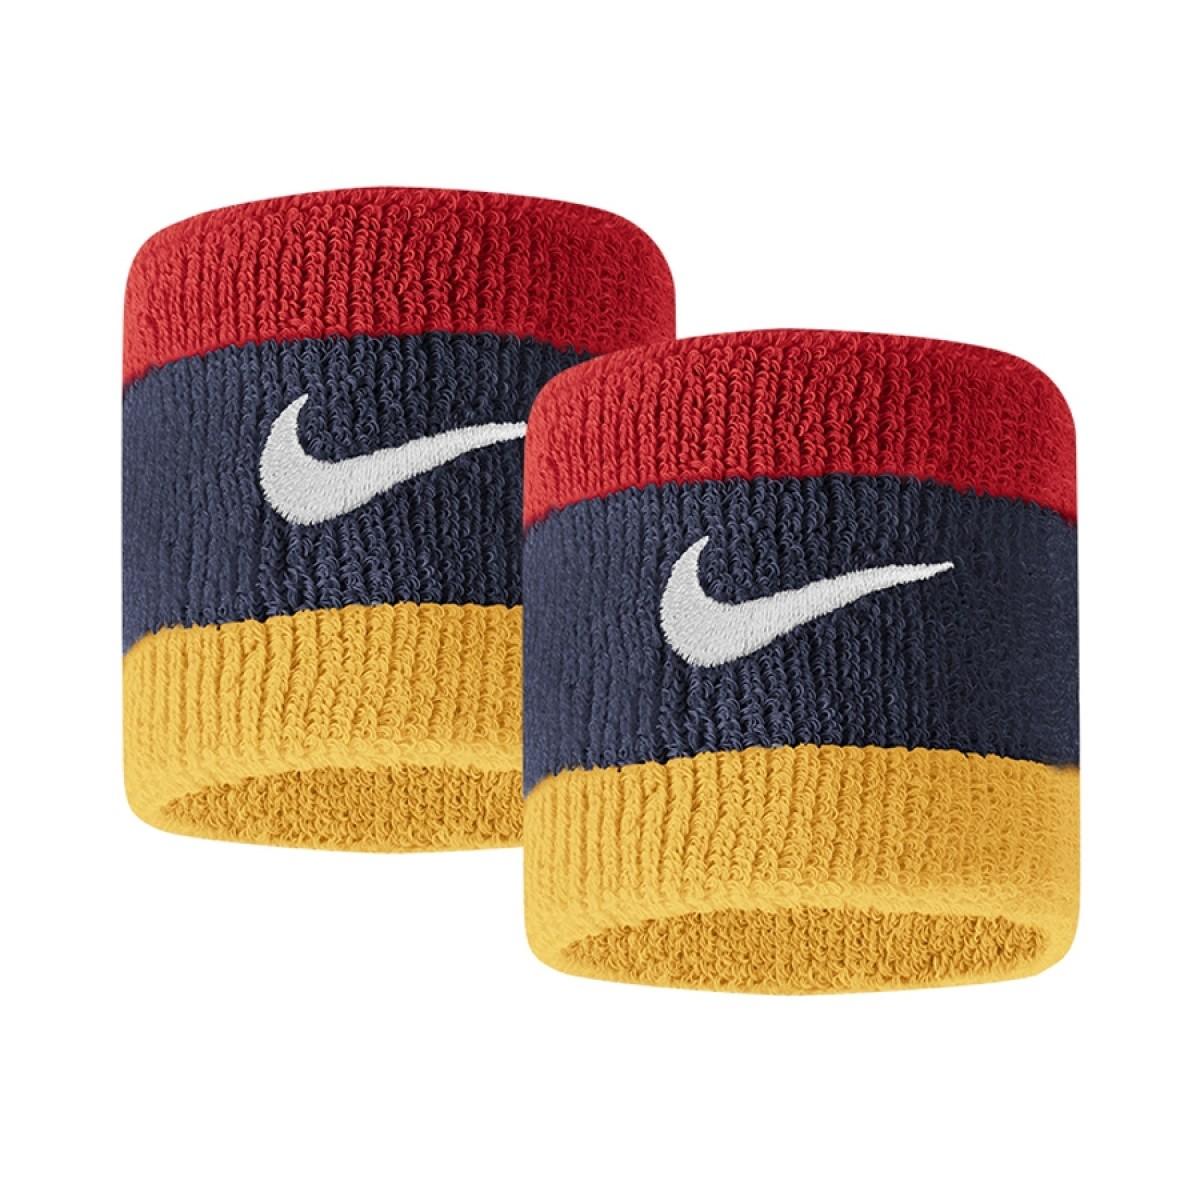 Nike Wristbands 'Multicolor'